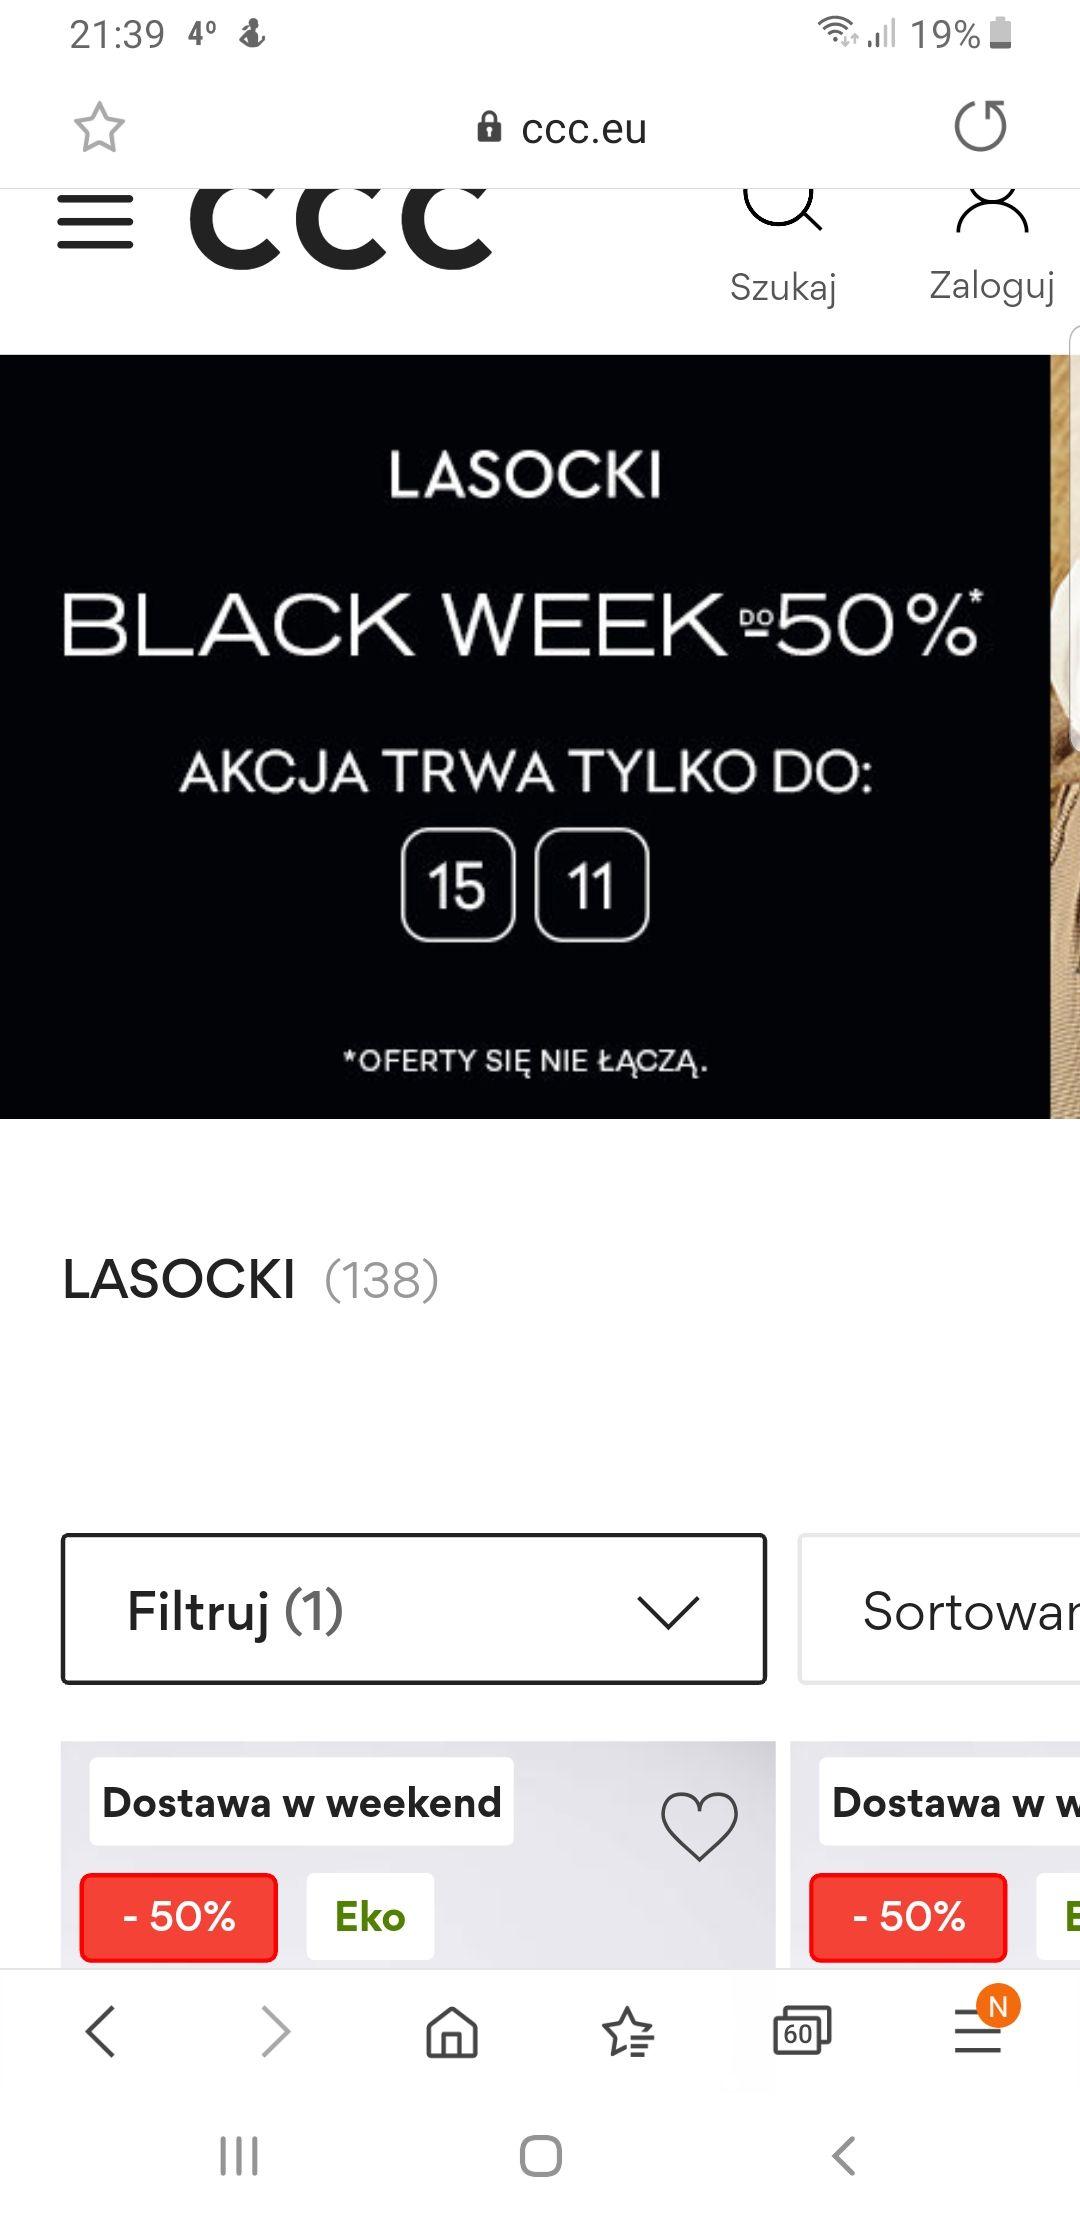 Lasocki do -50% CCC